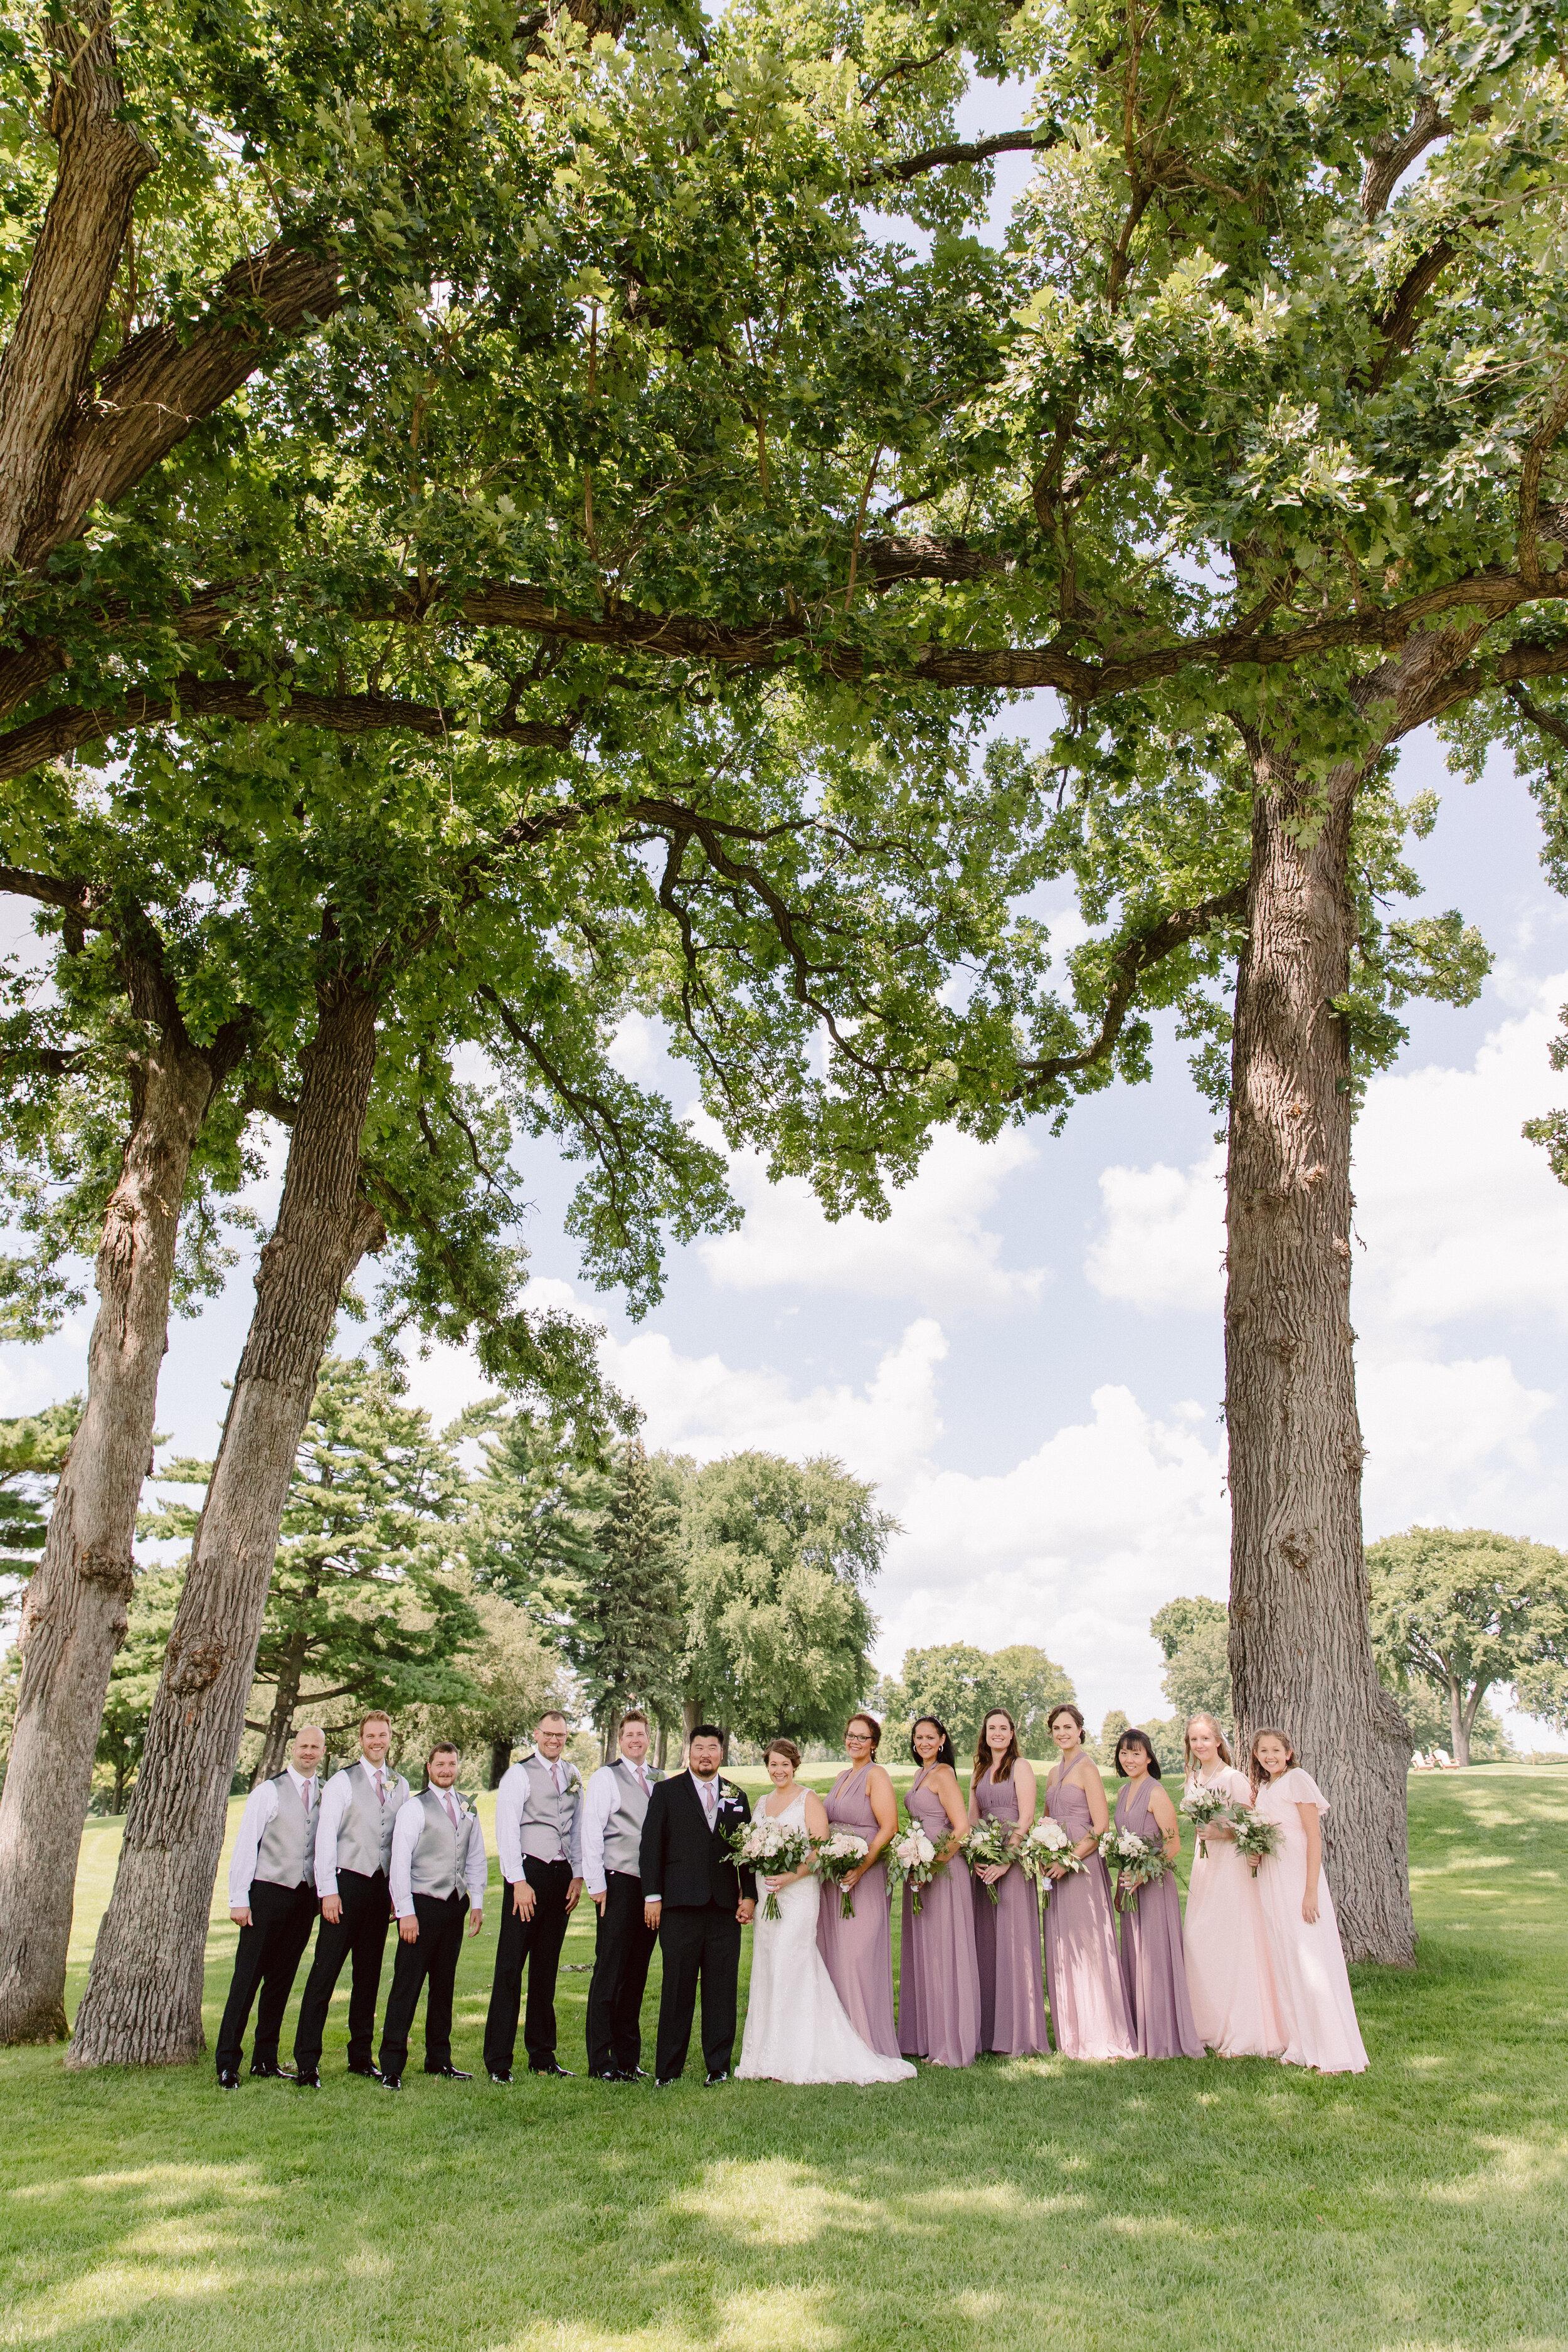 S&B Wedding - Family & Wedding Party-76.jpg